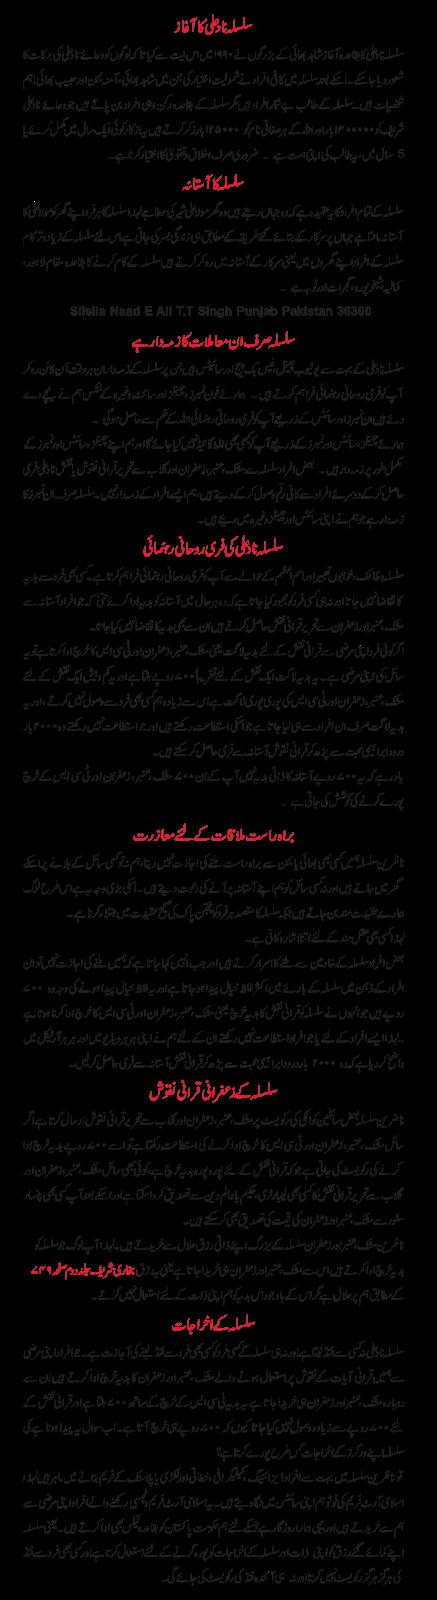 about-naad-e-ali